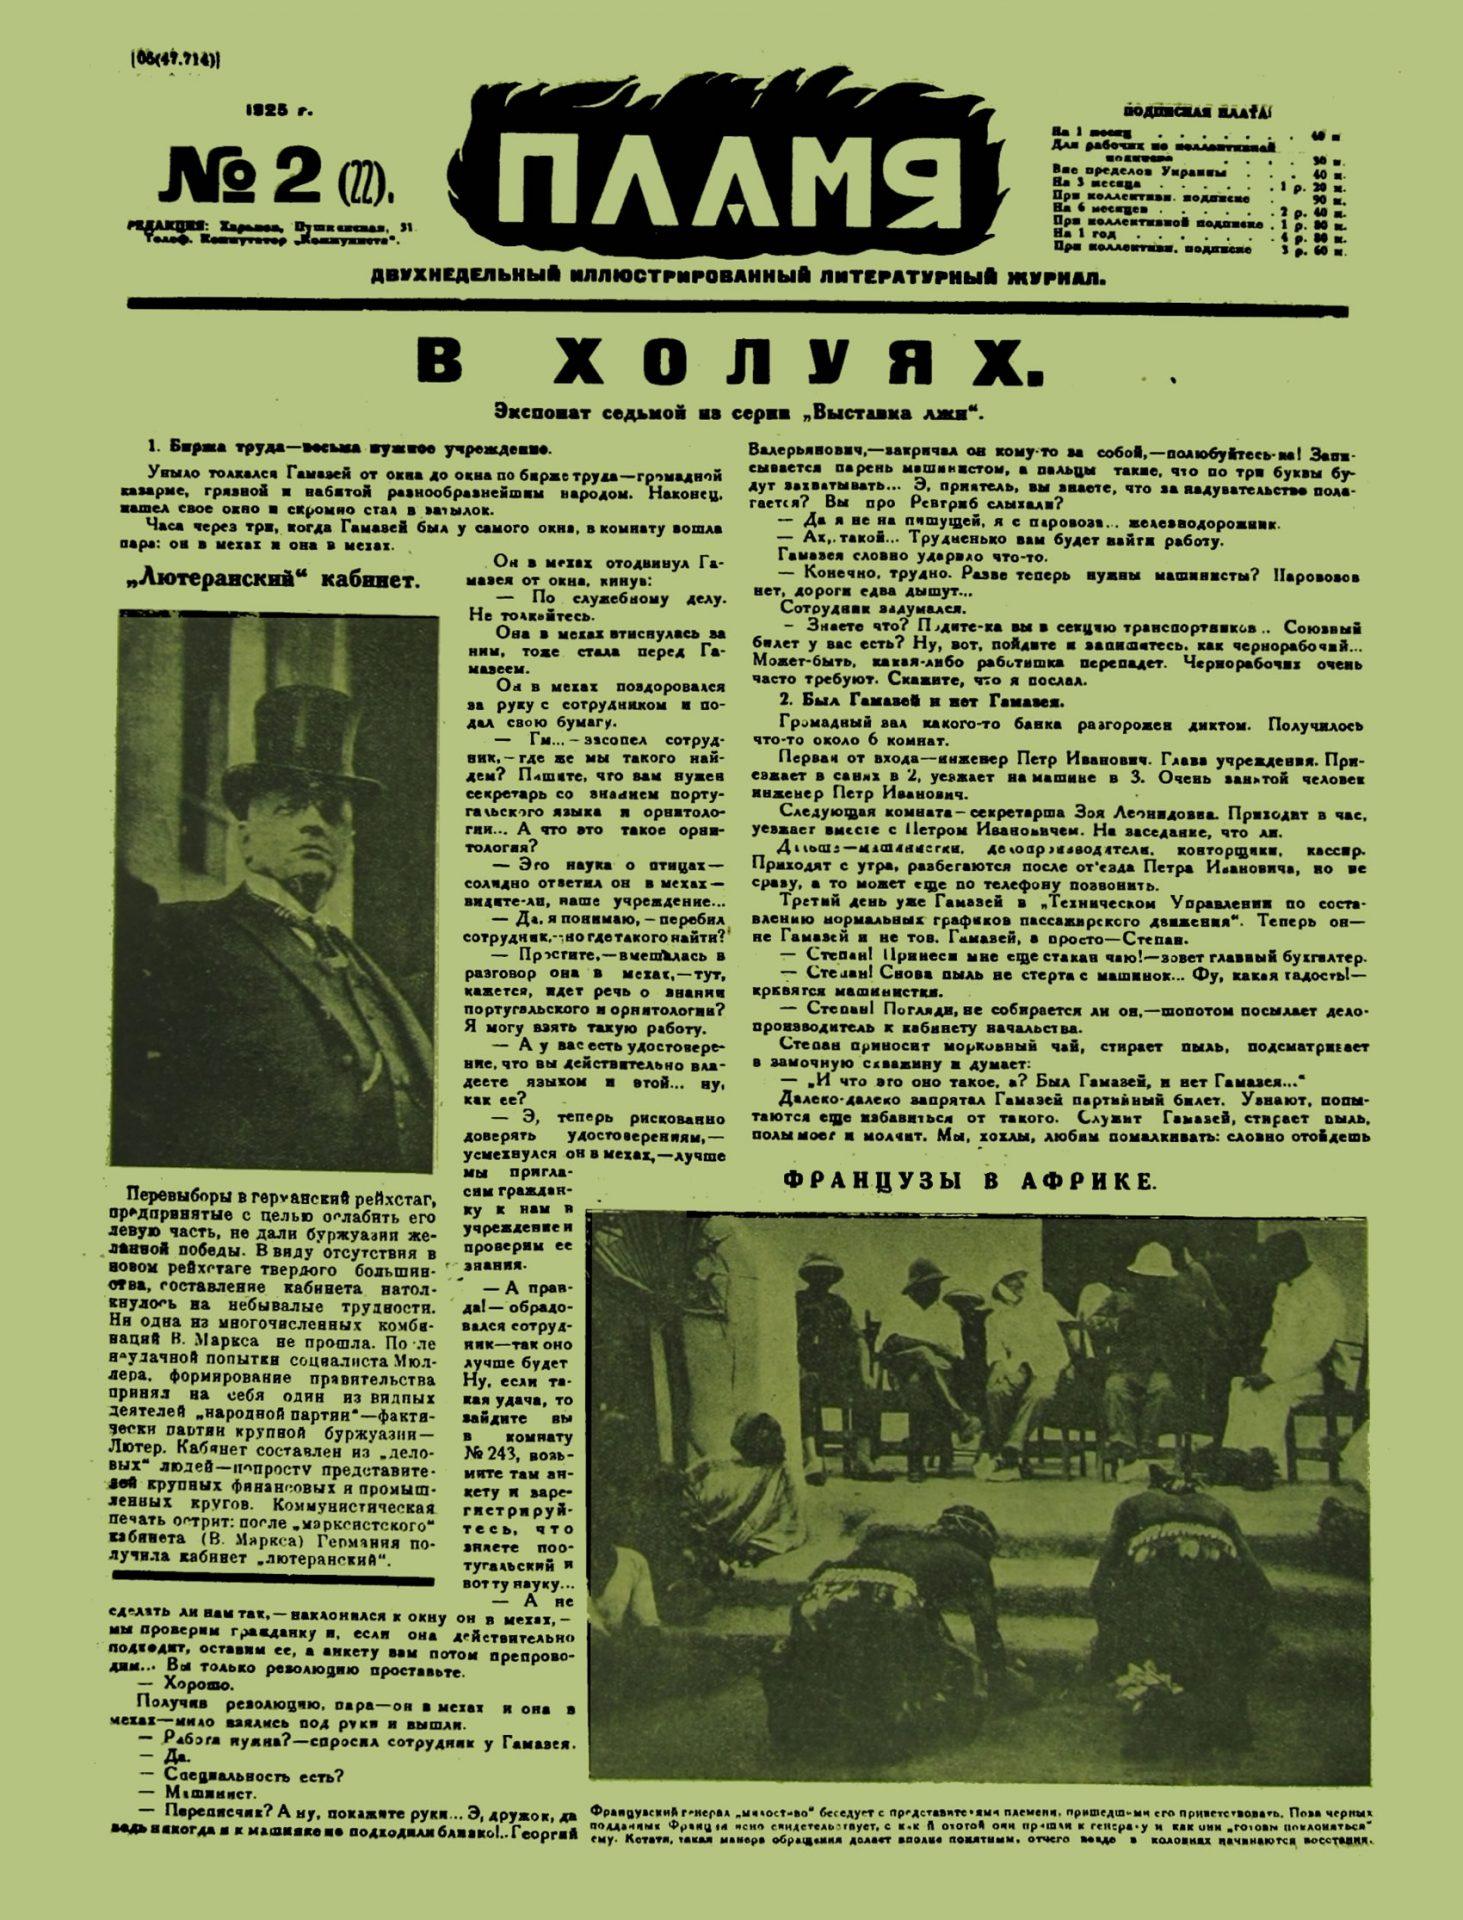 Пламя_1925_№2